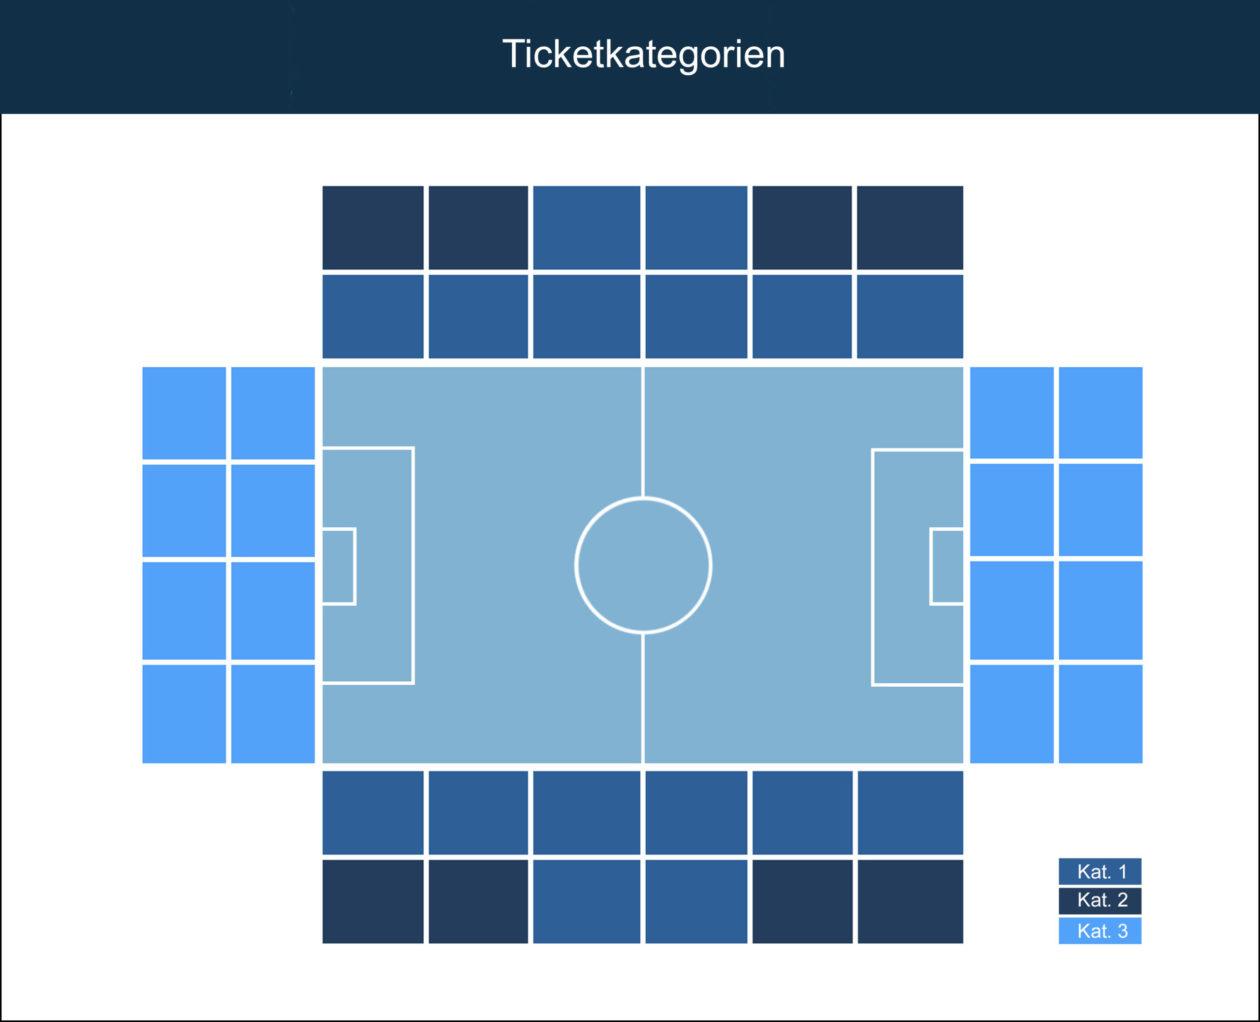 Fussball-Stadionplan - Ticketkategorien